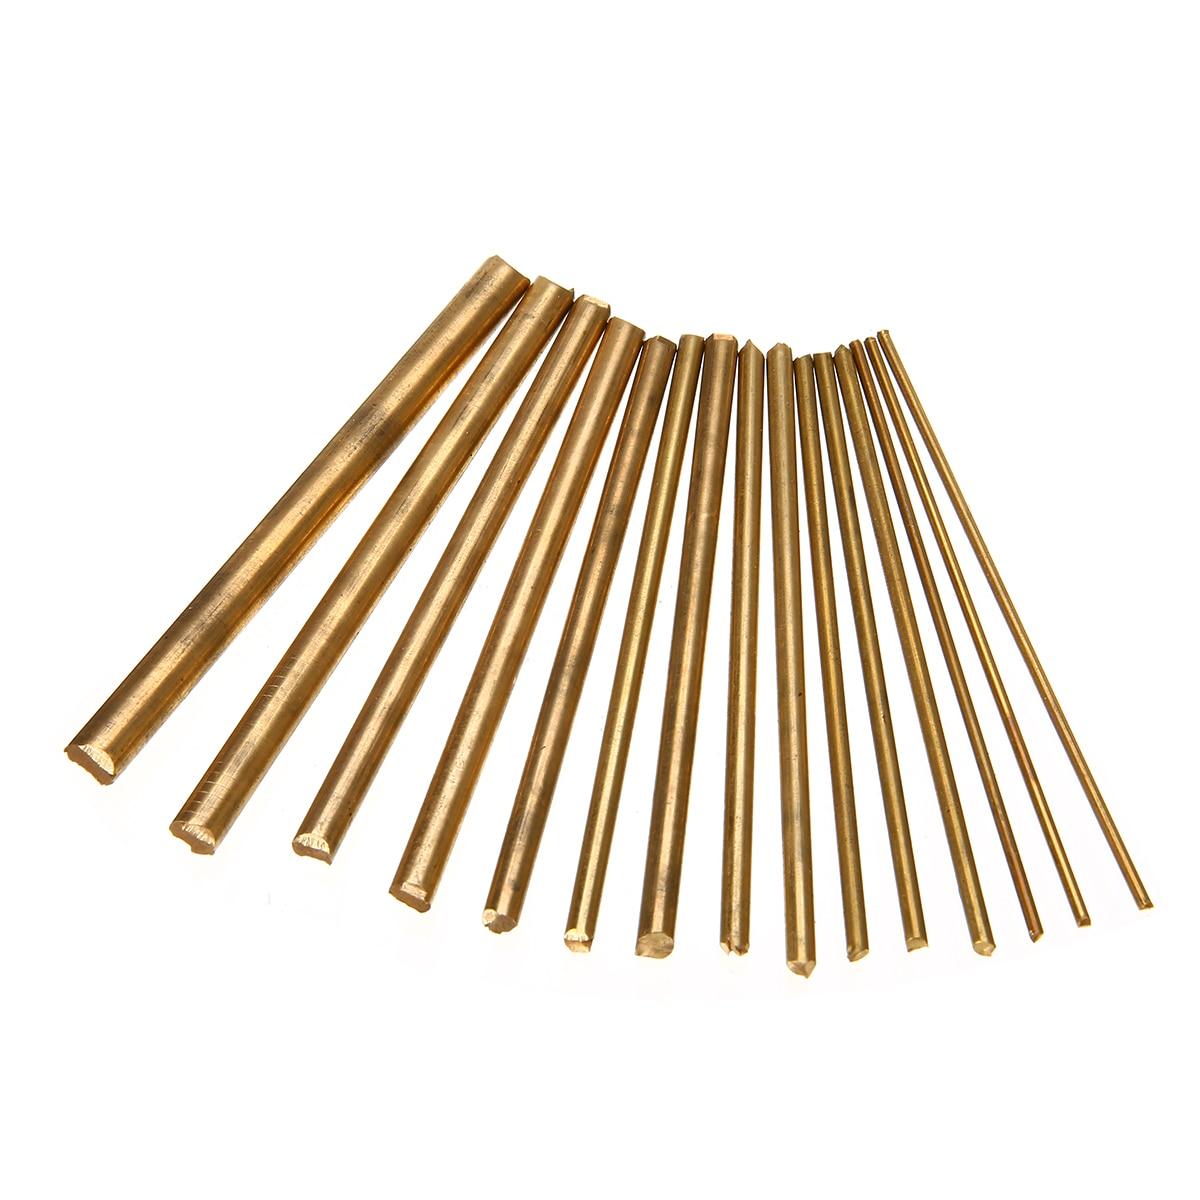 15pcs Brass Round Rod Bar Watchmaker Lathe DIY Watch Tool Parts 100mm Length 2/3/4/5/6/7/8mm Diameter For DIY Craft Making 2pcs hss grooving tool round turning lathe bars silver gray dia 5 1 5 2 5 3 5 4 5 5 5 6 5 7 5 8 5 9 6 6 1 6 2 9mm 100mm long